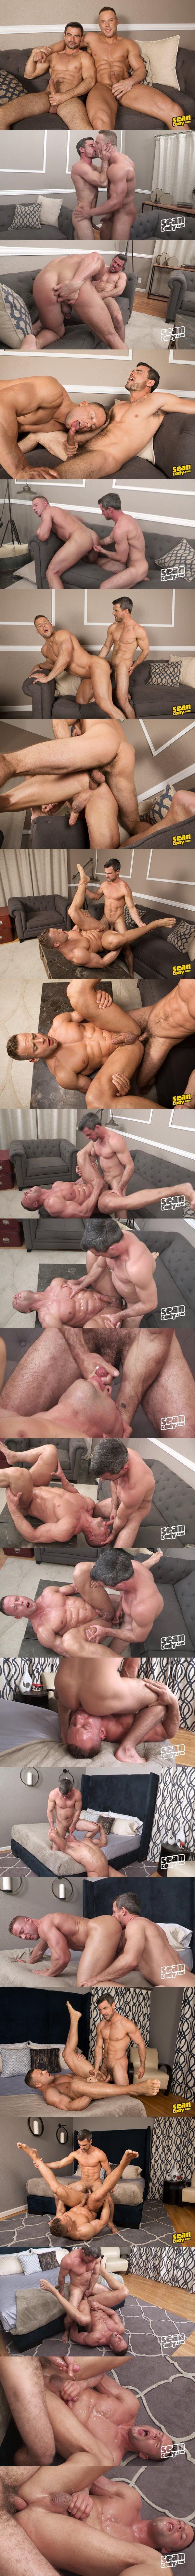 Daniel barebacks and breeds big muscle hunk Jack at Seancody 02